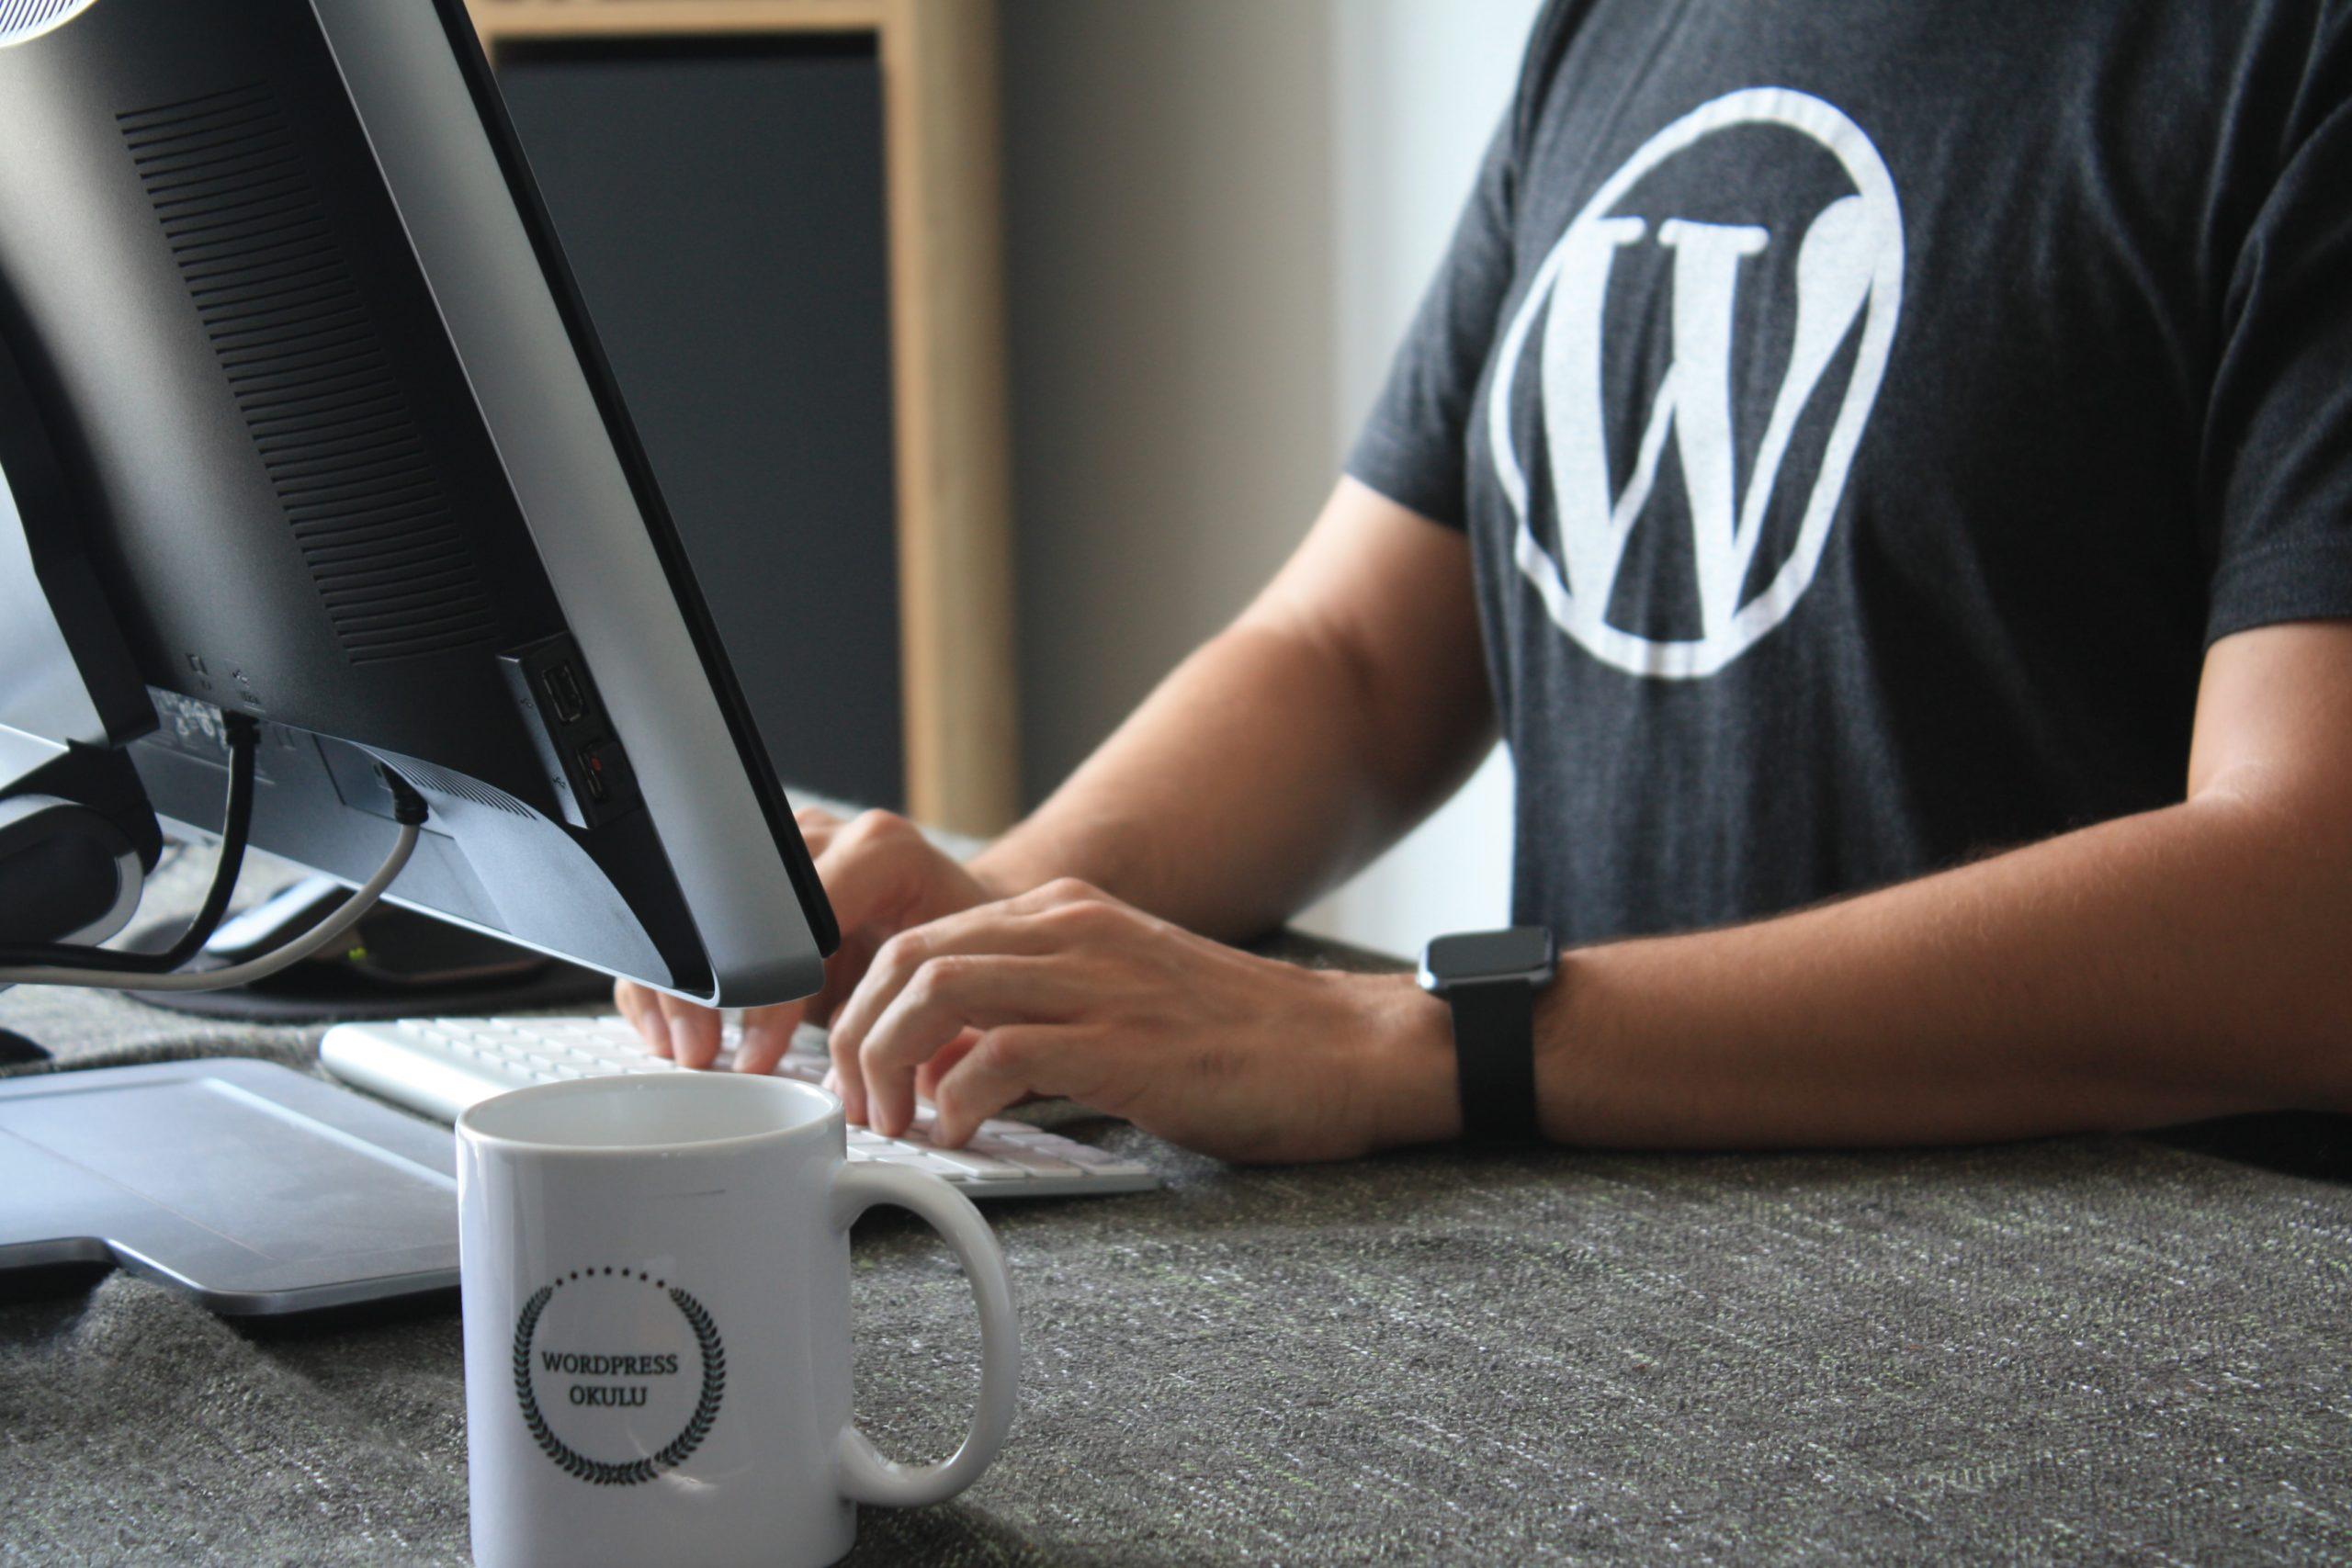 WordPressを使ったホームページ作成は4工程に分かれる